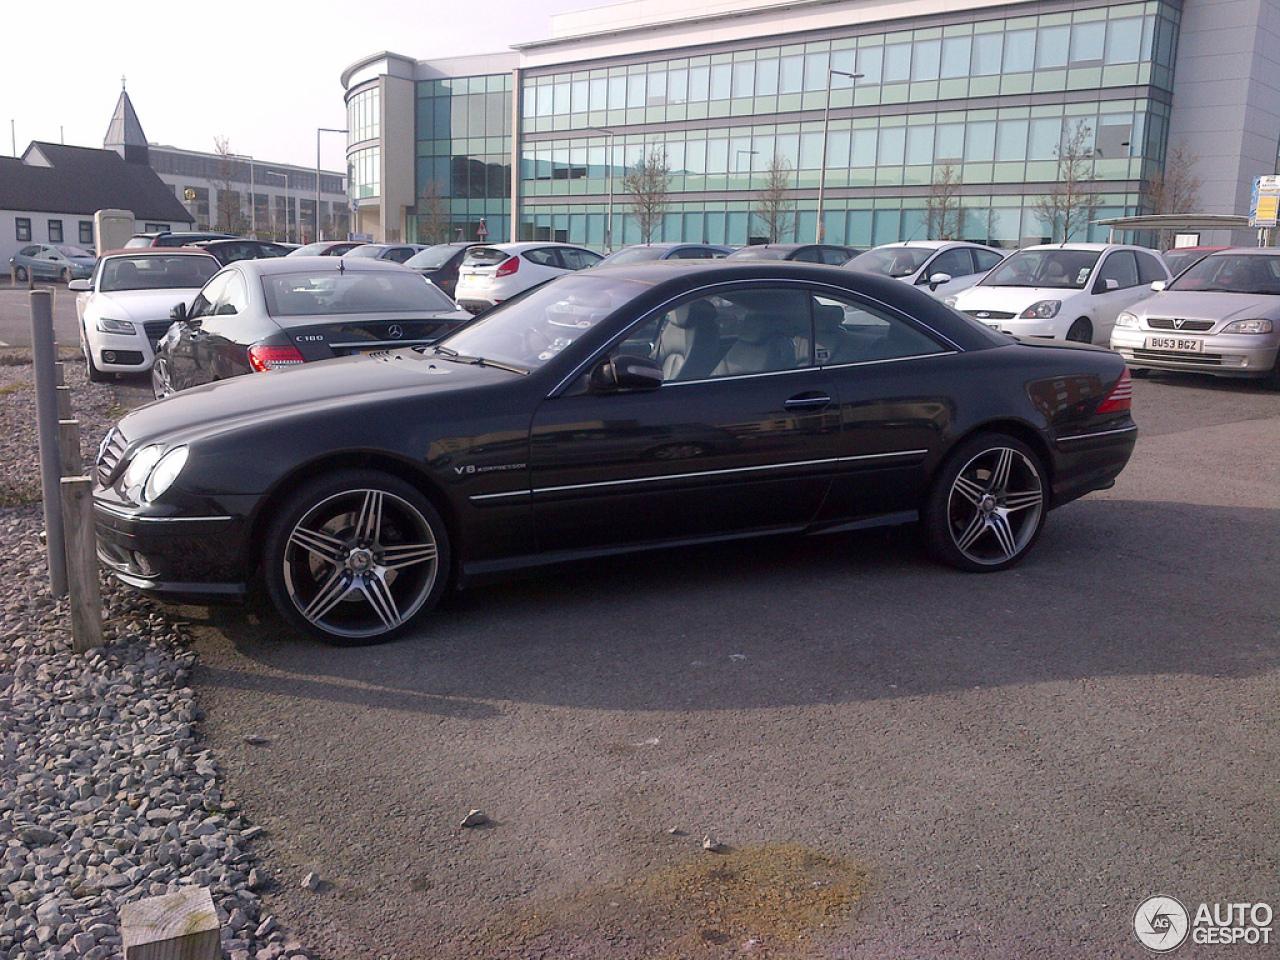 Mercedes benz cl 55 amg c215 4 march 2013 autogespot for Mercedes benz cl 55 amg